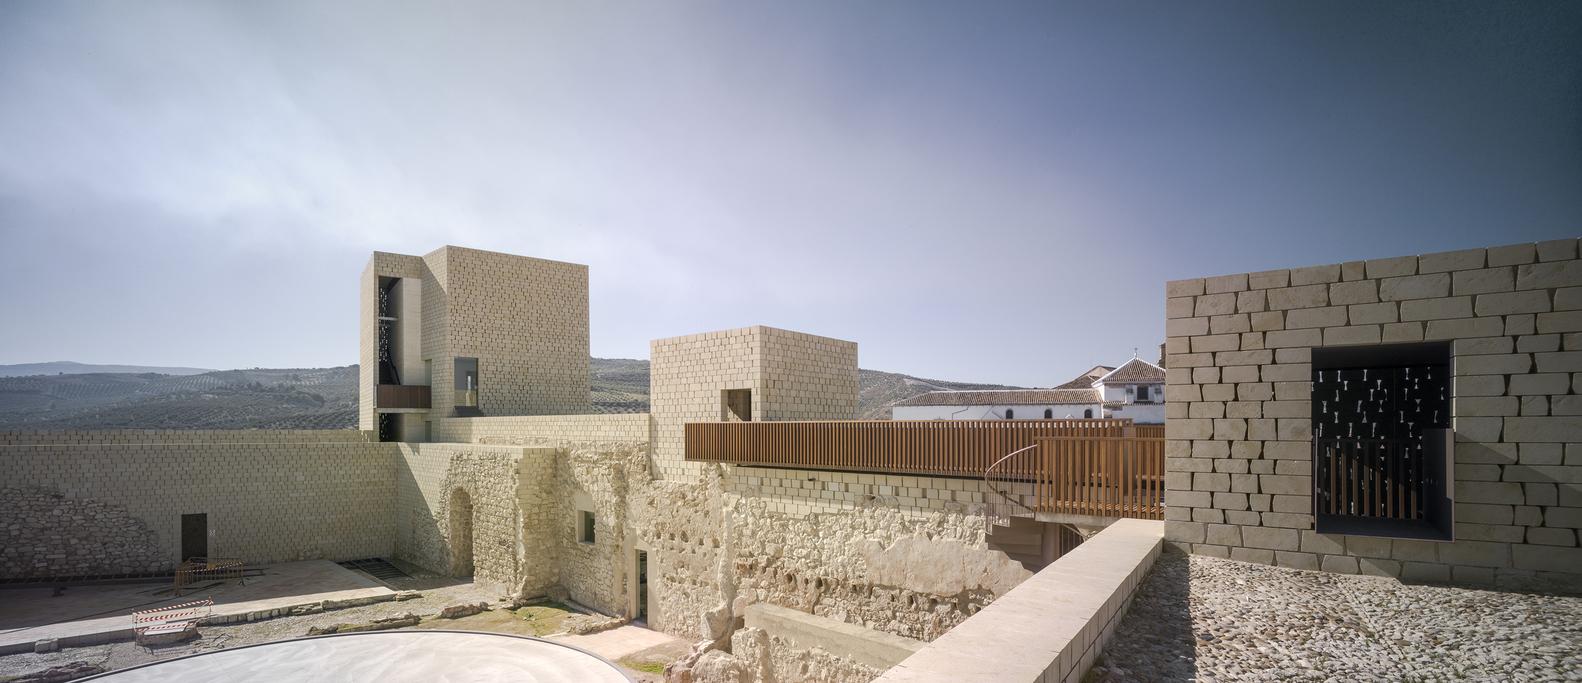 Baena Castle Restoration / José Manuel López Osorio